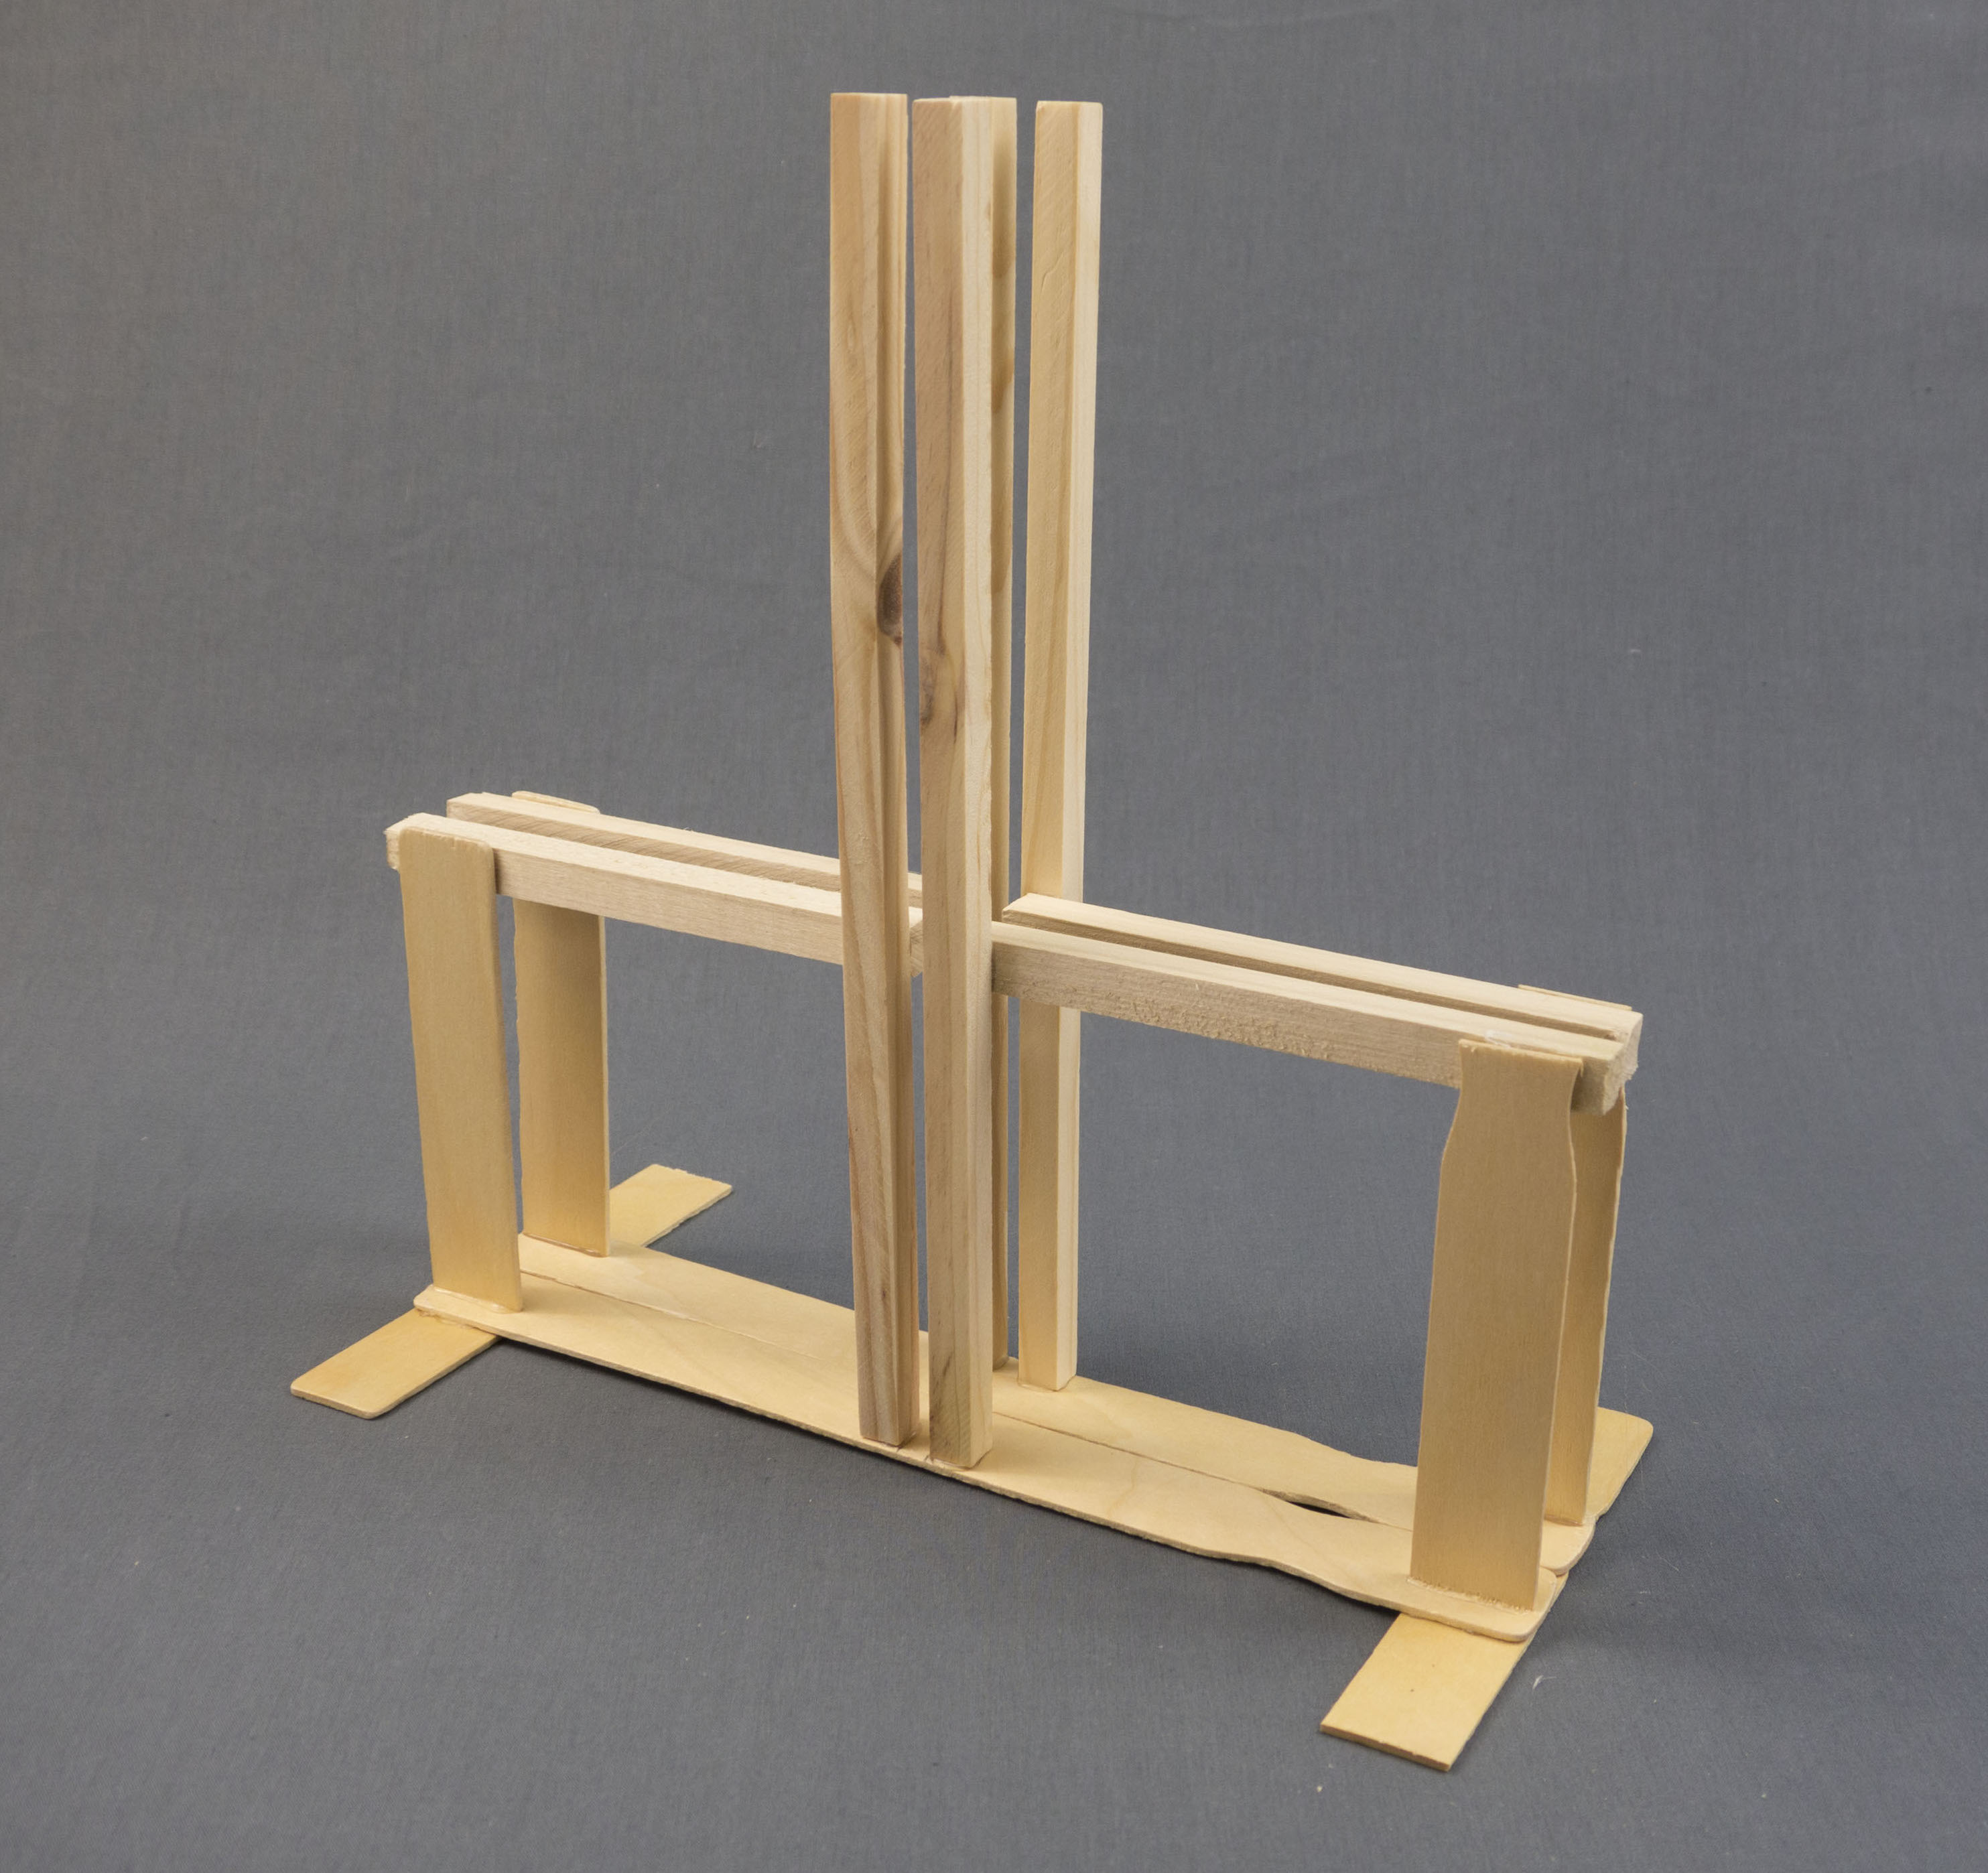 Picture of Build the Glide Rails